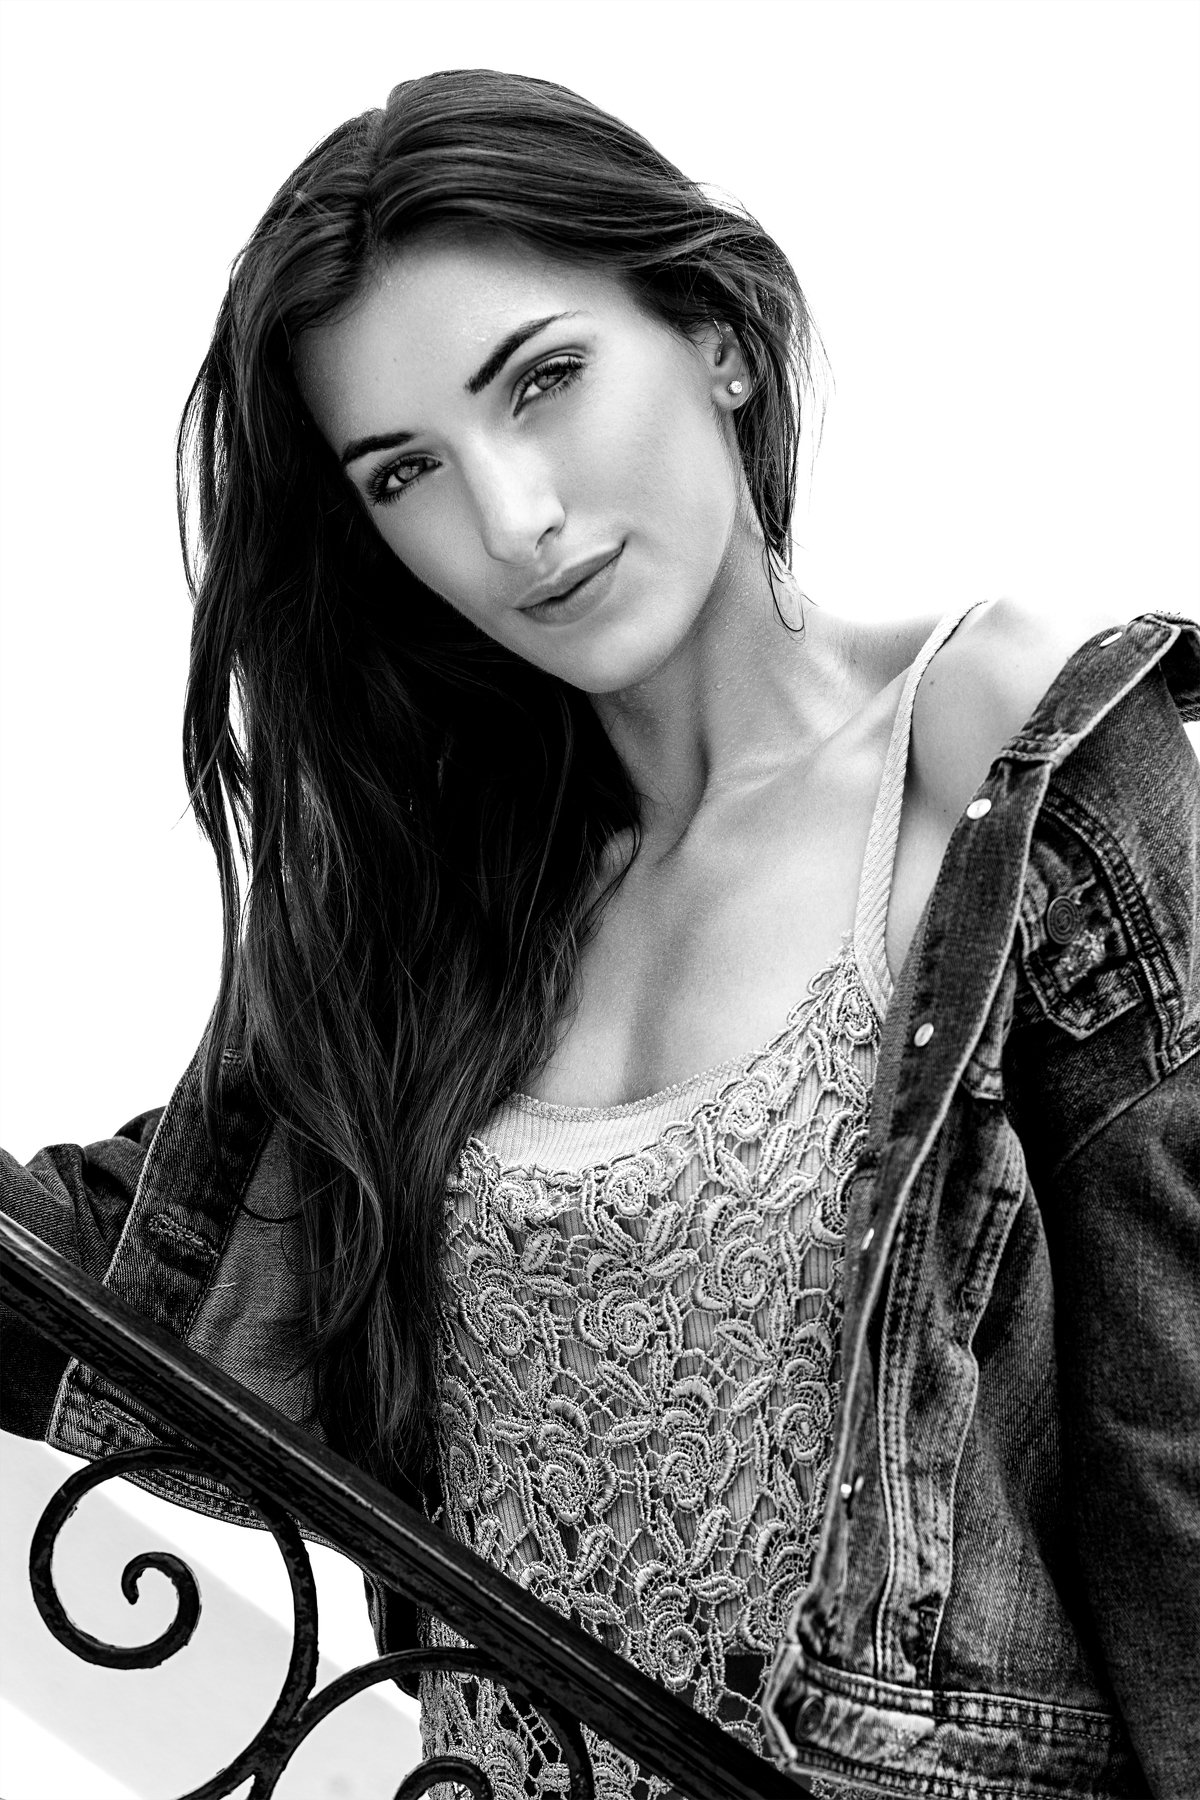 beauty, beauty photographer, model, headshot, closeup, makeup, long hair, eyes, facial, photographer, photography, outdoor, natural light, McGillivray-Birnie Gary